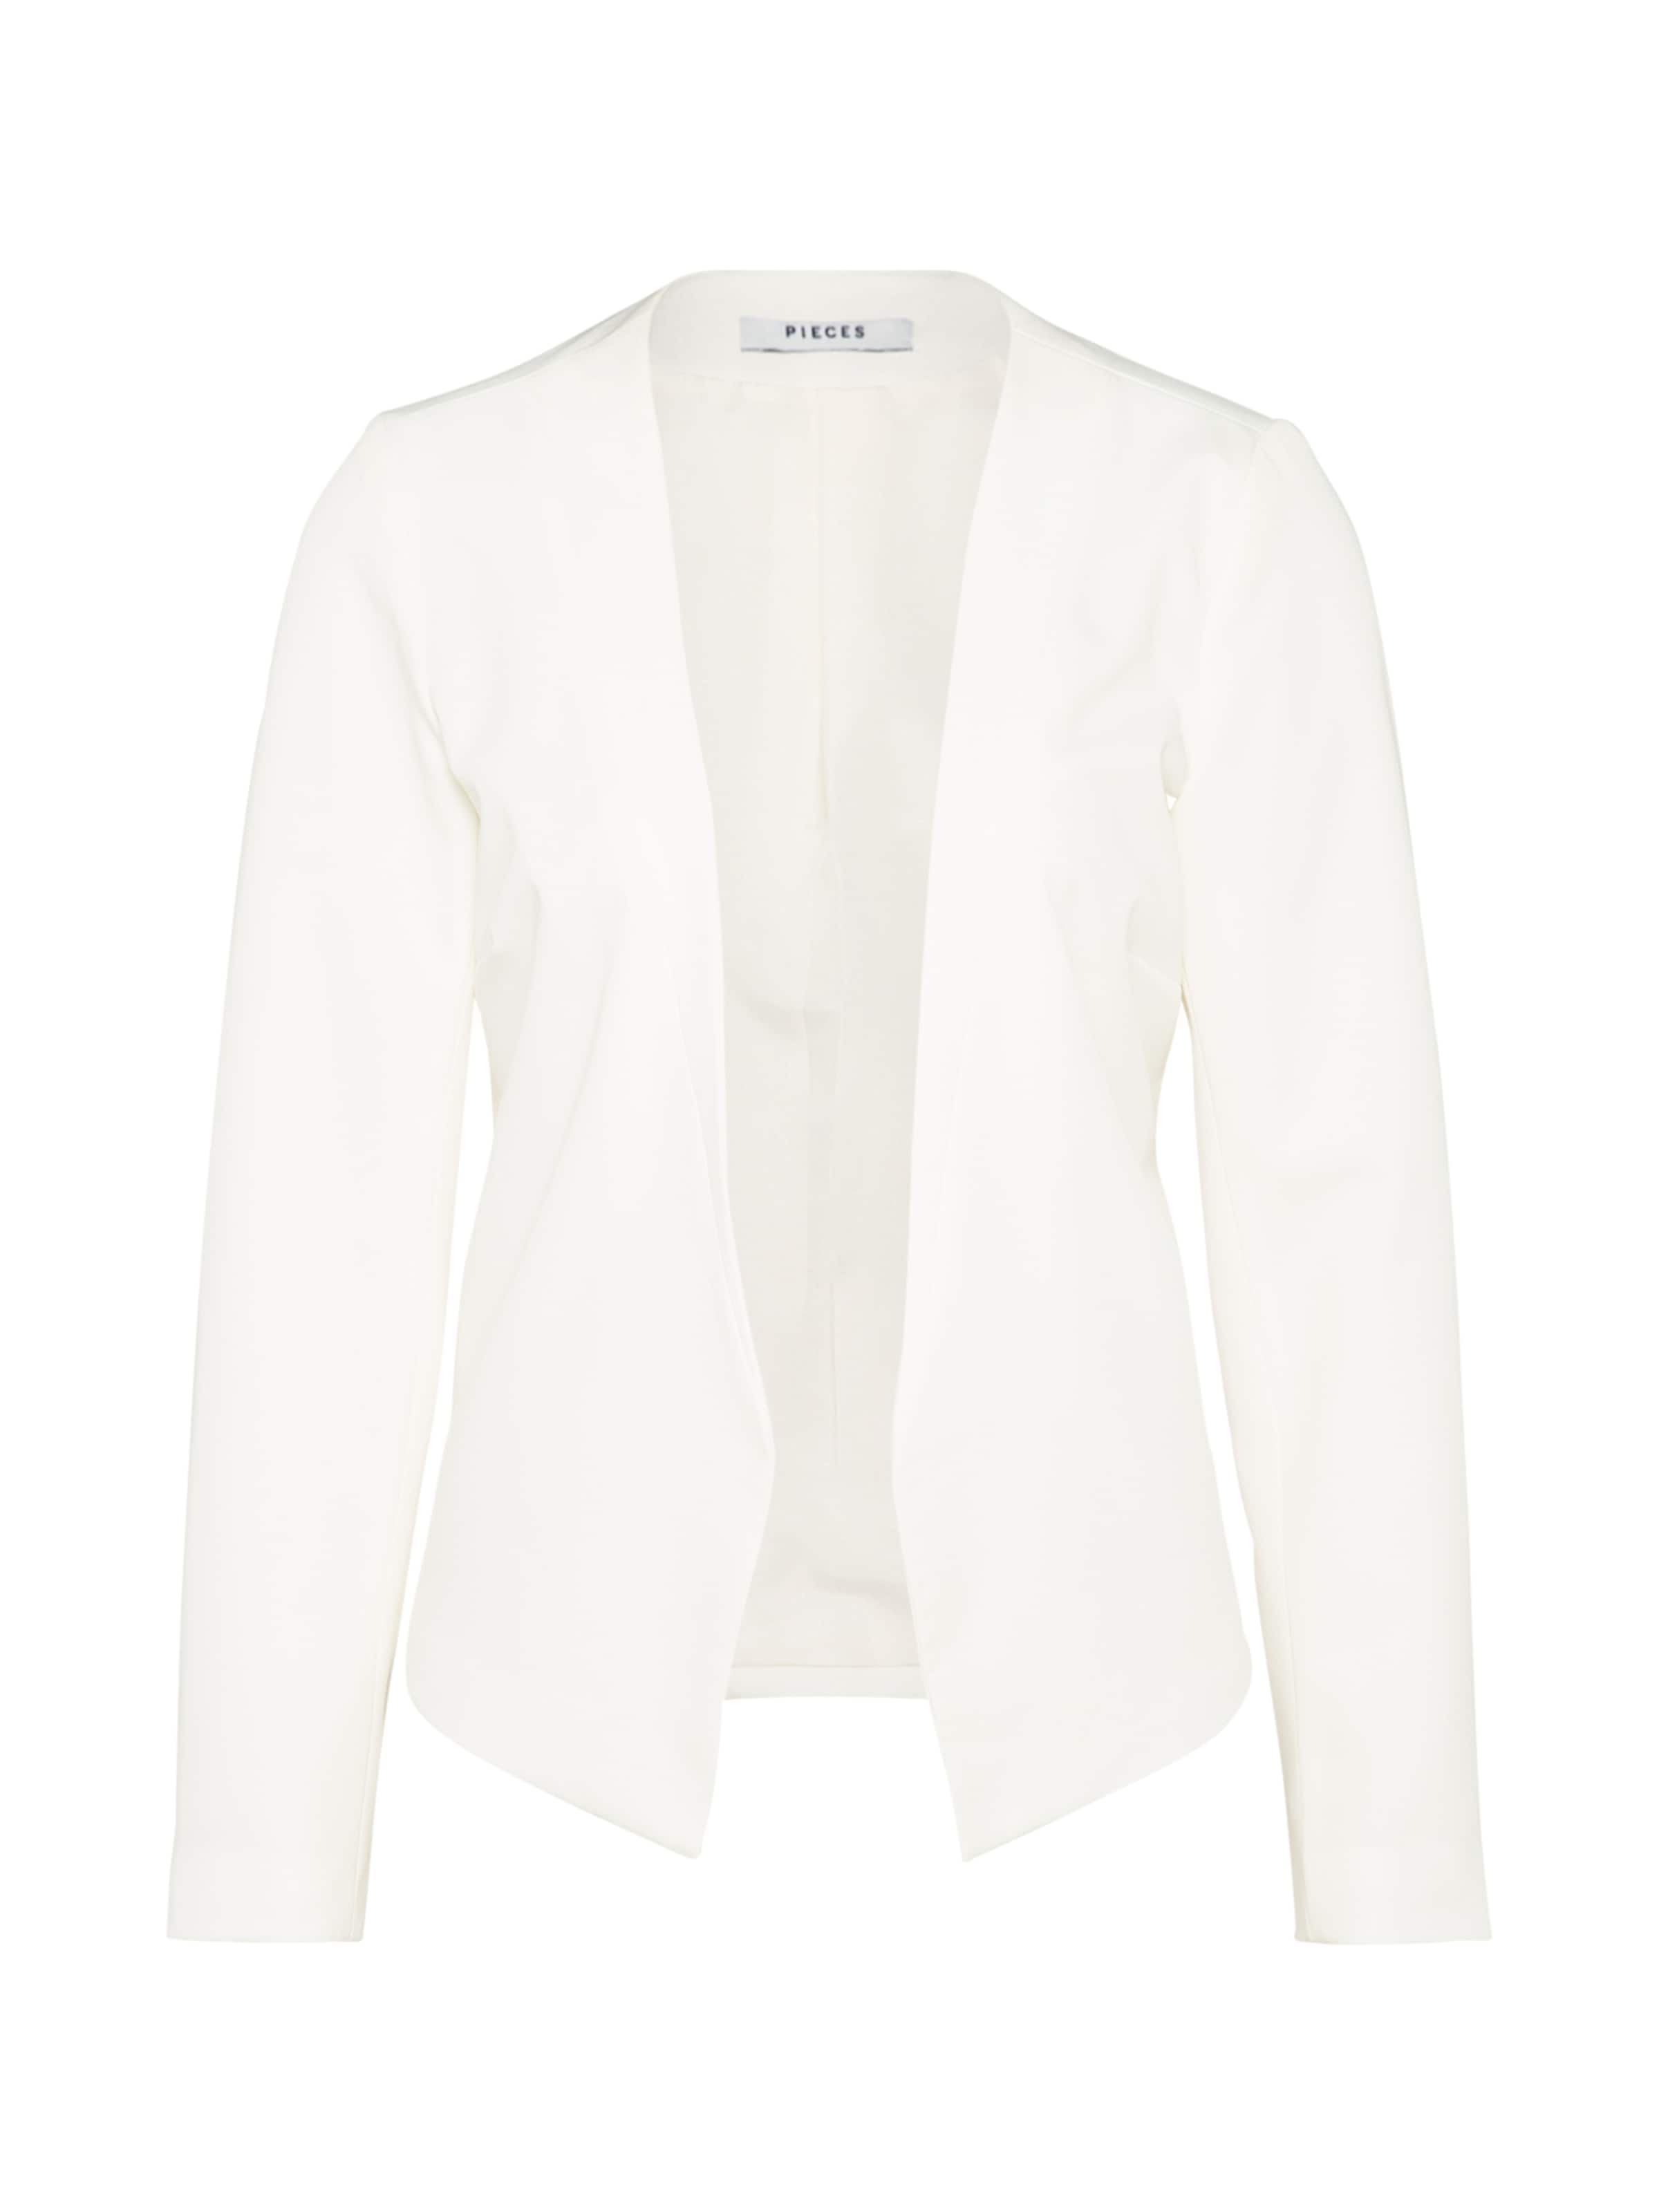 Blanc En 'ivana' Cassé Pieces Blazer 43RA5jL